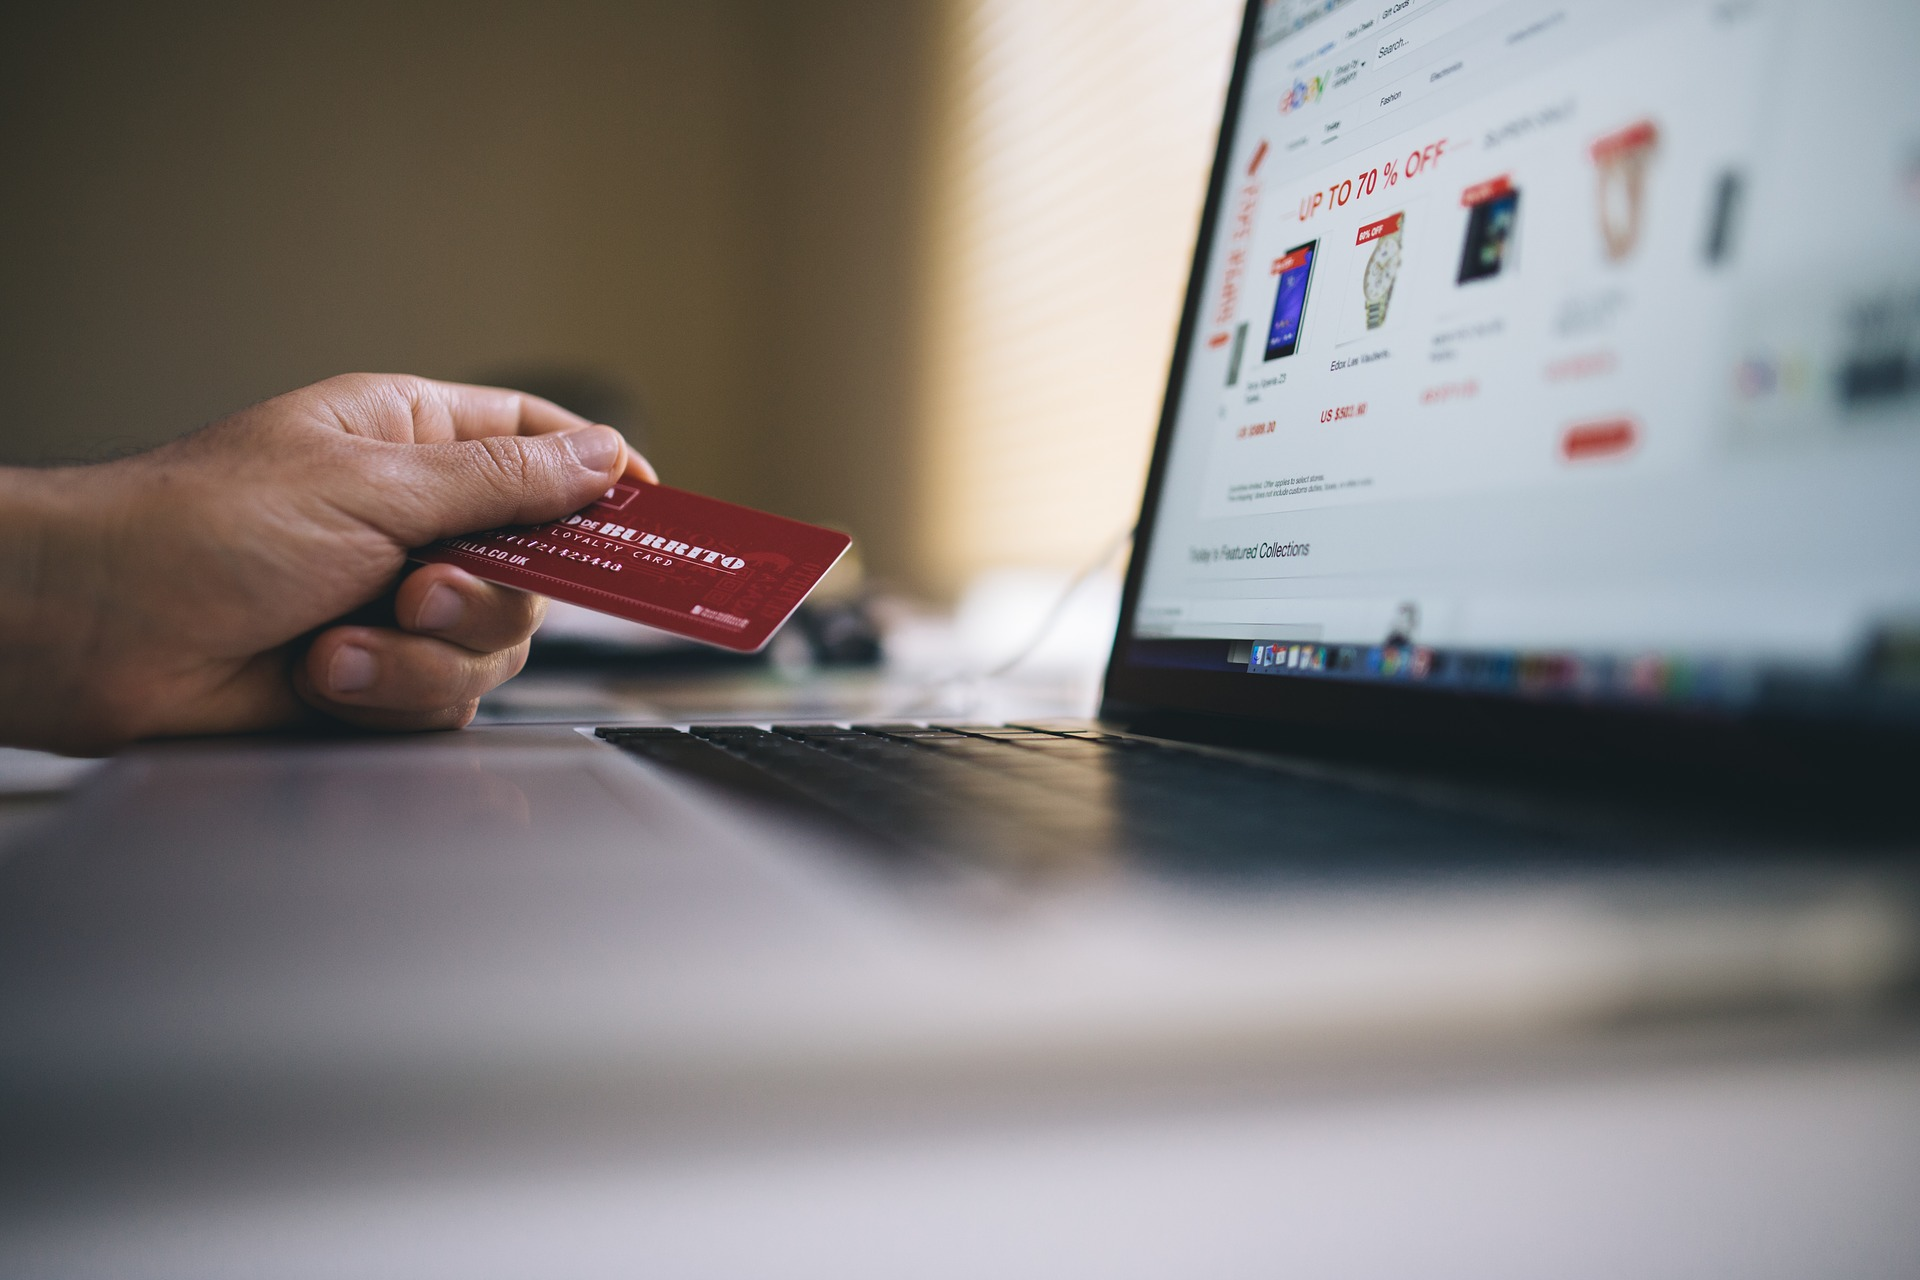 Opryljudneno obsjag ukraїnśkyh onlajn-vytrat na pokupky za I pivriččja 2017-go